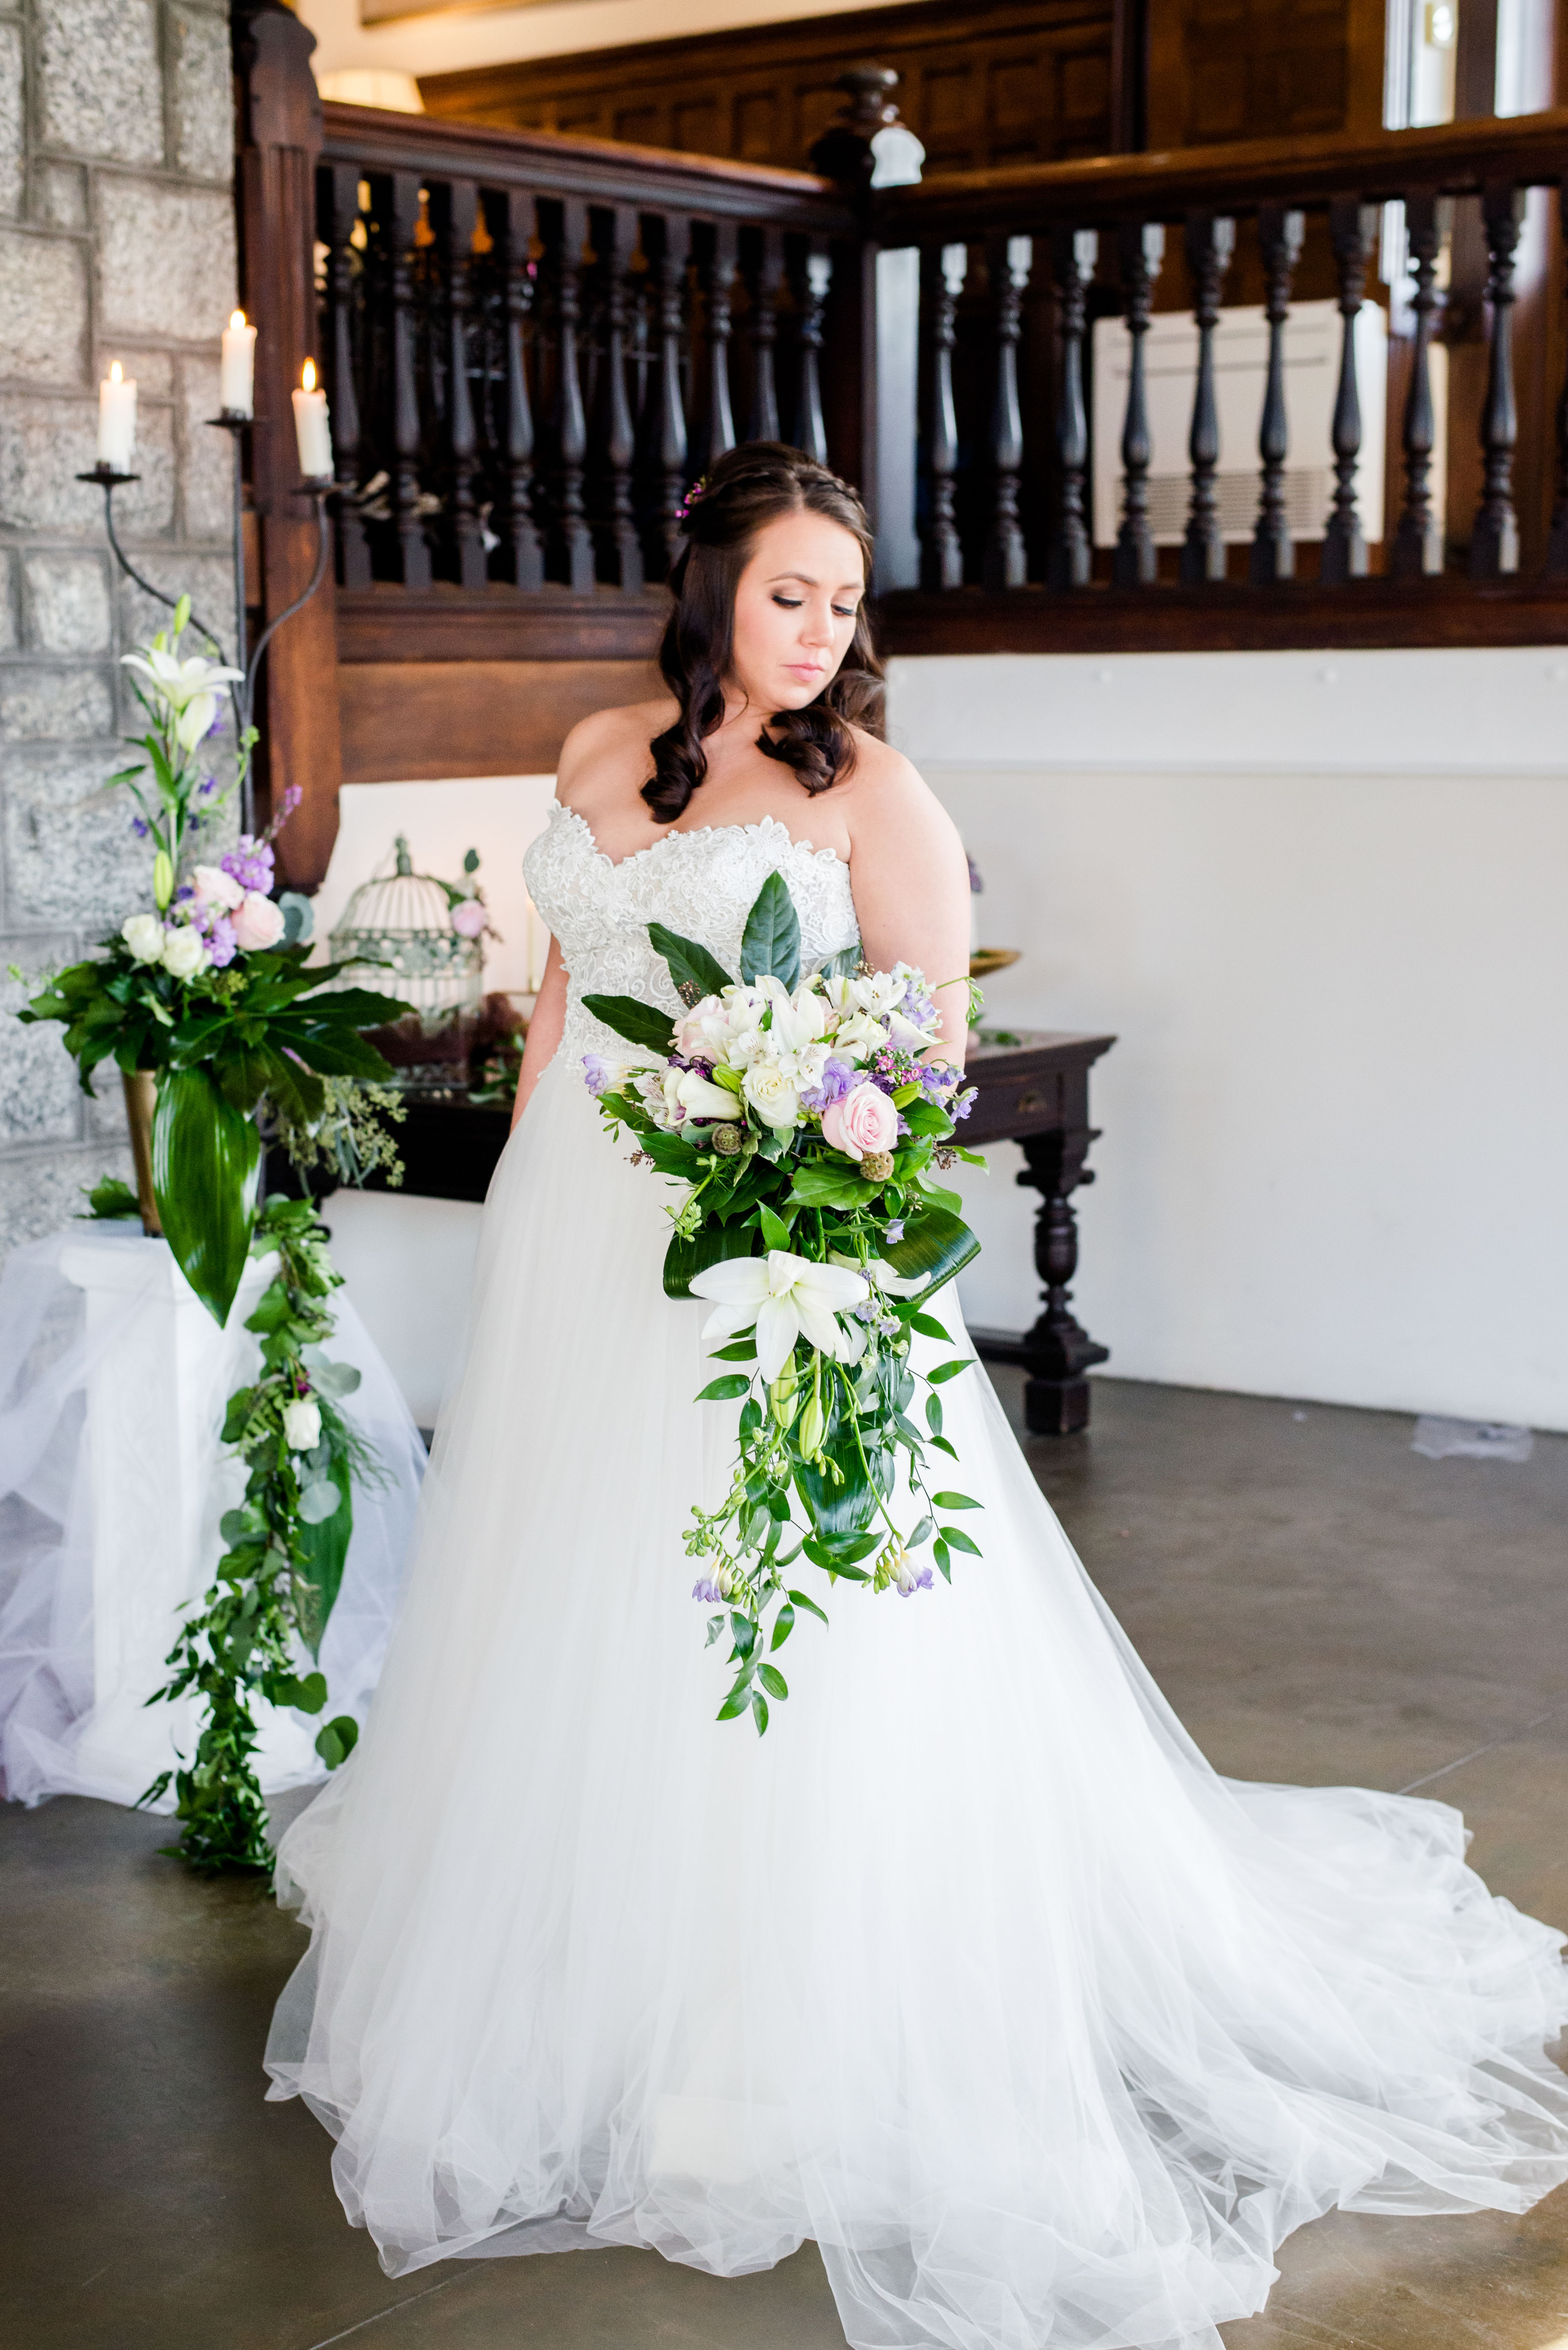 Baldwin-School-Wedding-Photographer-Event-Venue-Pennsylvania-Mainline-Andrea-Krout-Photography-12